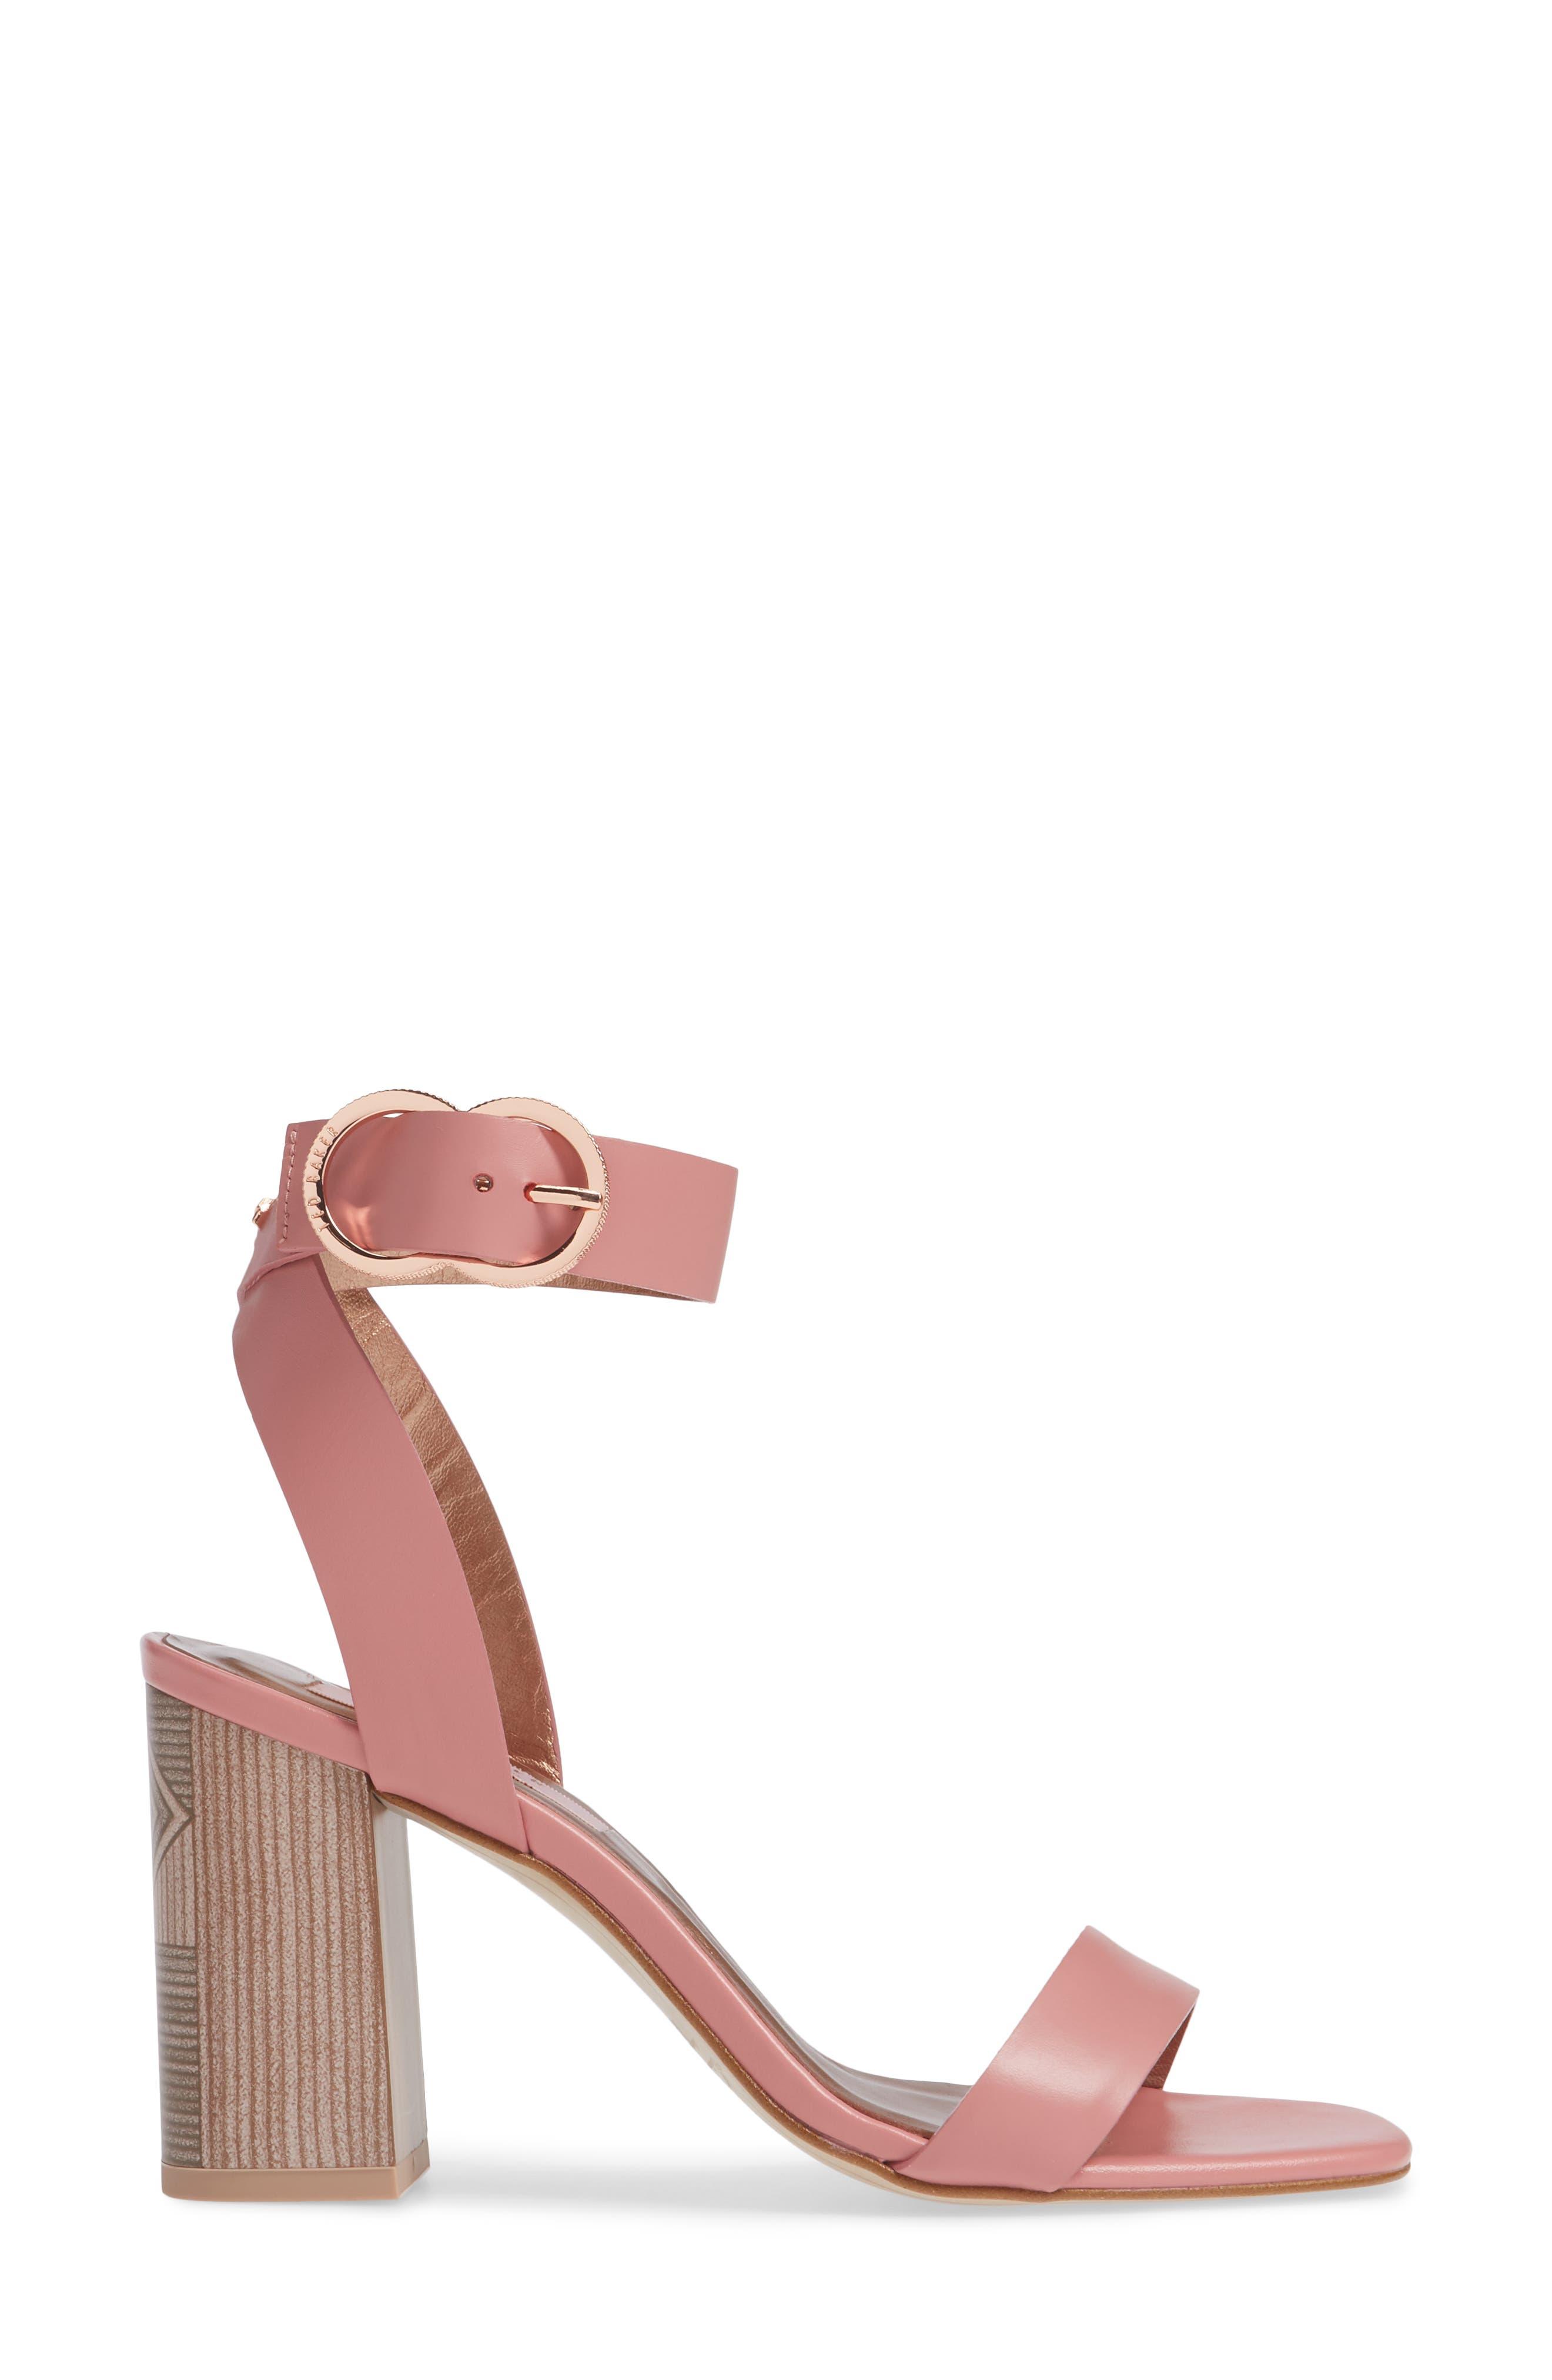 Vallama Block Heel Sandal,                             Alternate thumbnail 3, color,                             PINK LEATHER